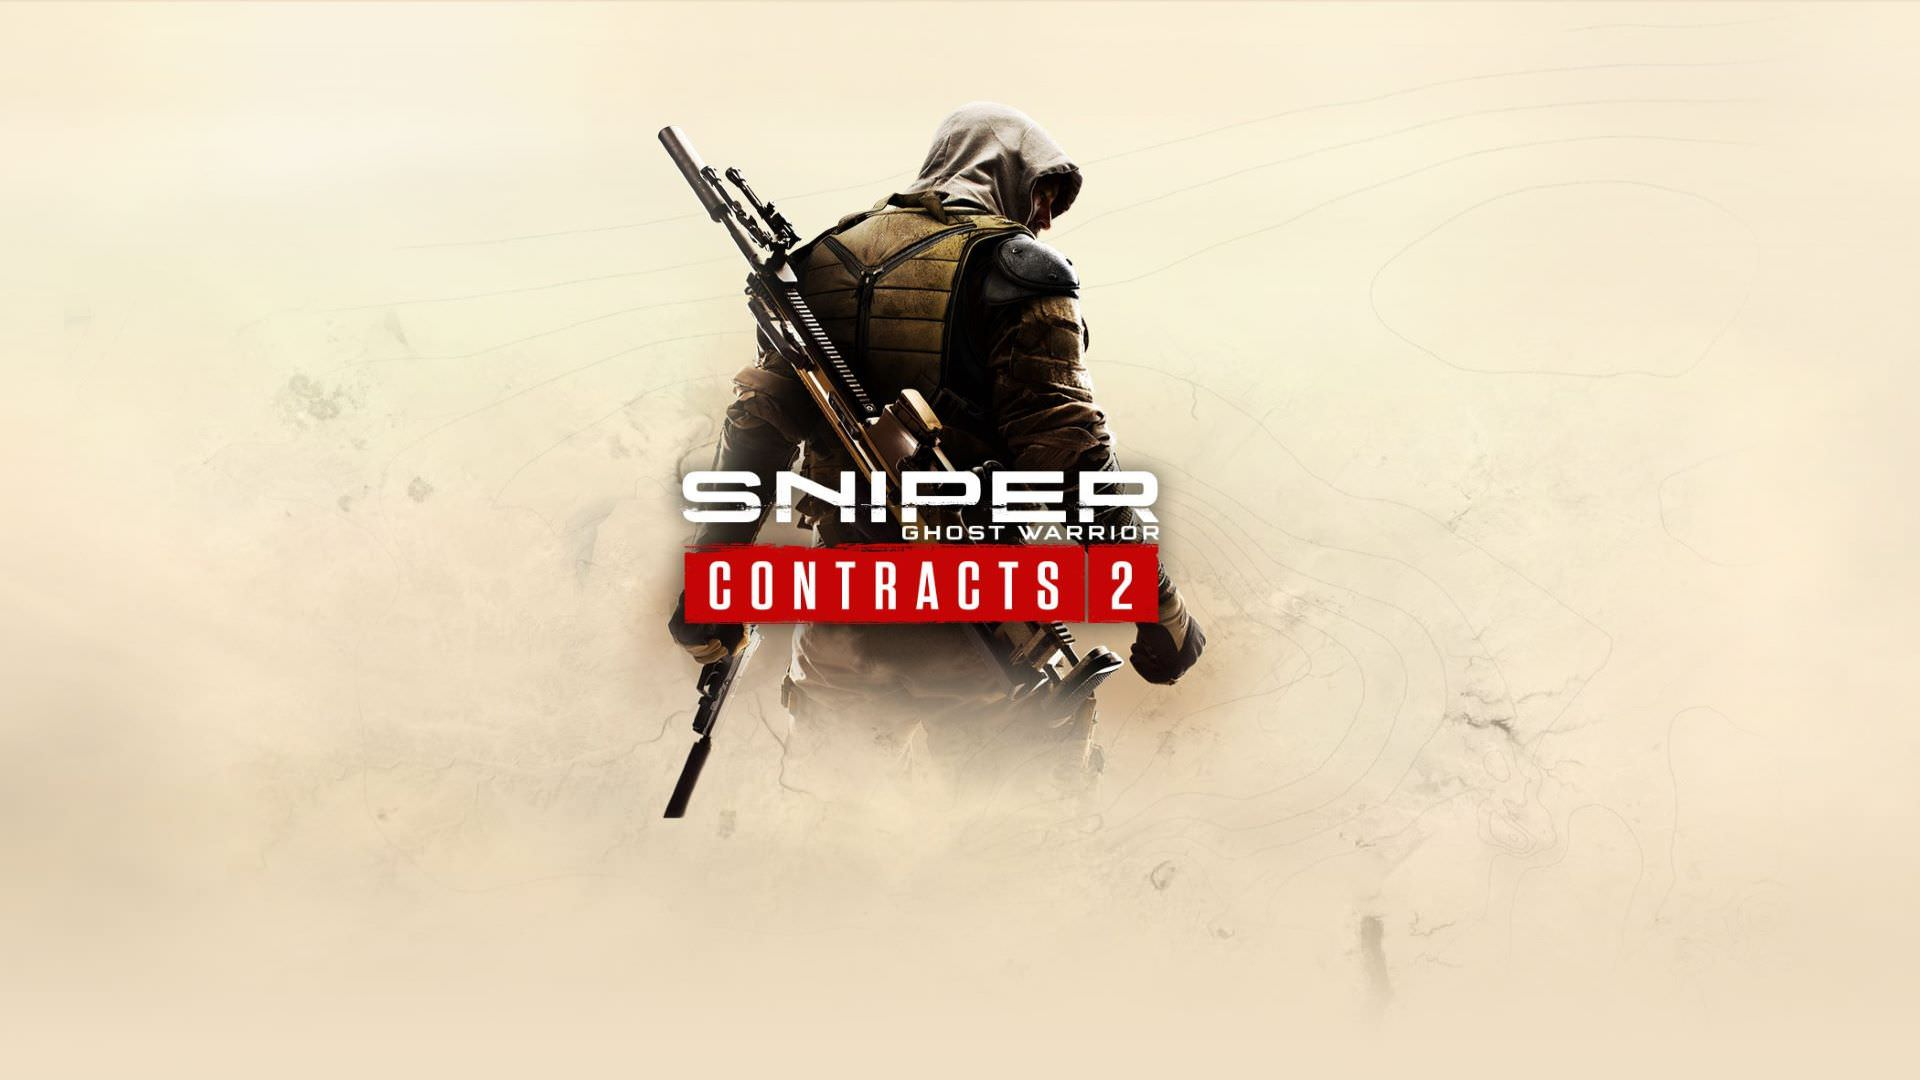 تریلر گیم پلی بازی Sniper Ghost Warrior Contracts 2؛ اعلام تاریخ انتشار